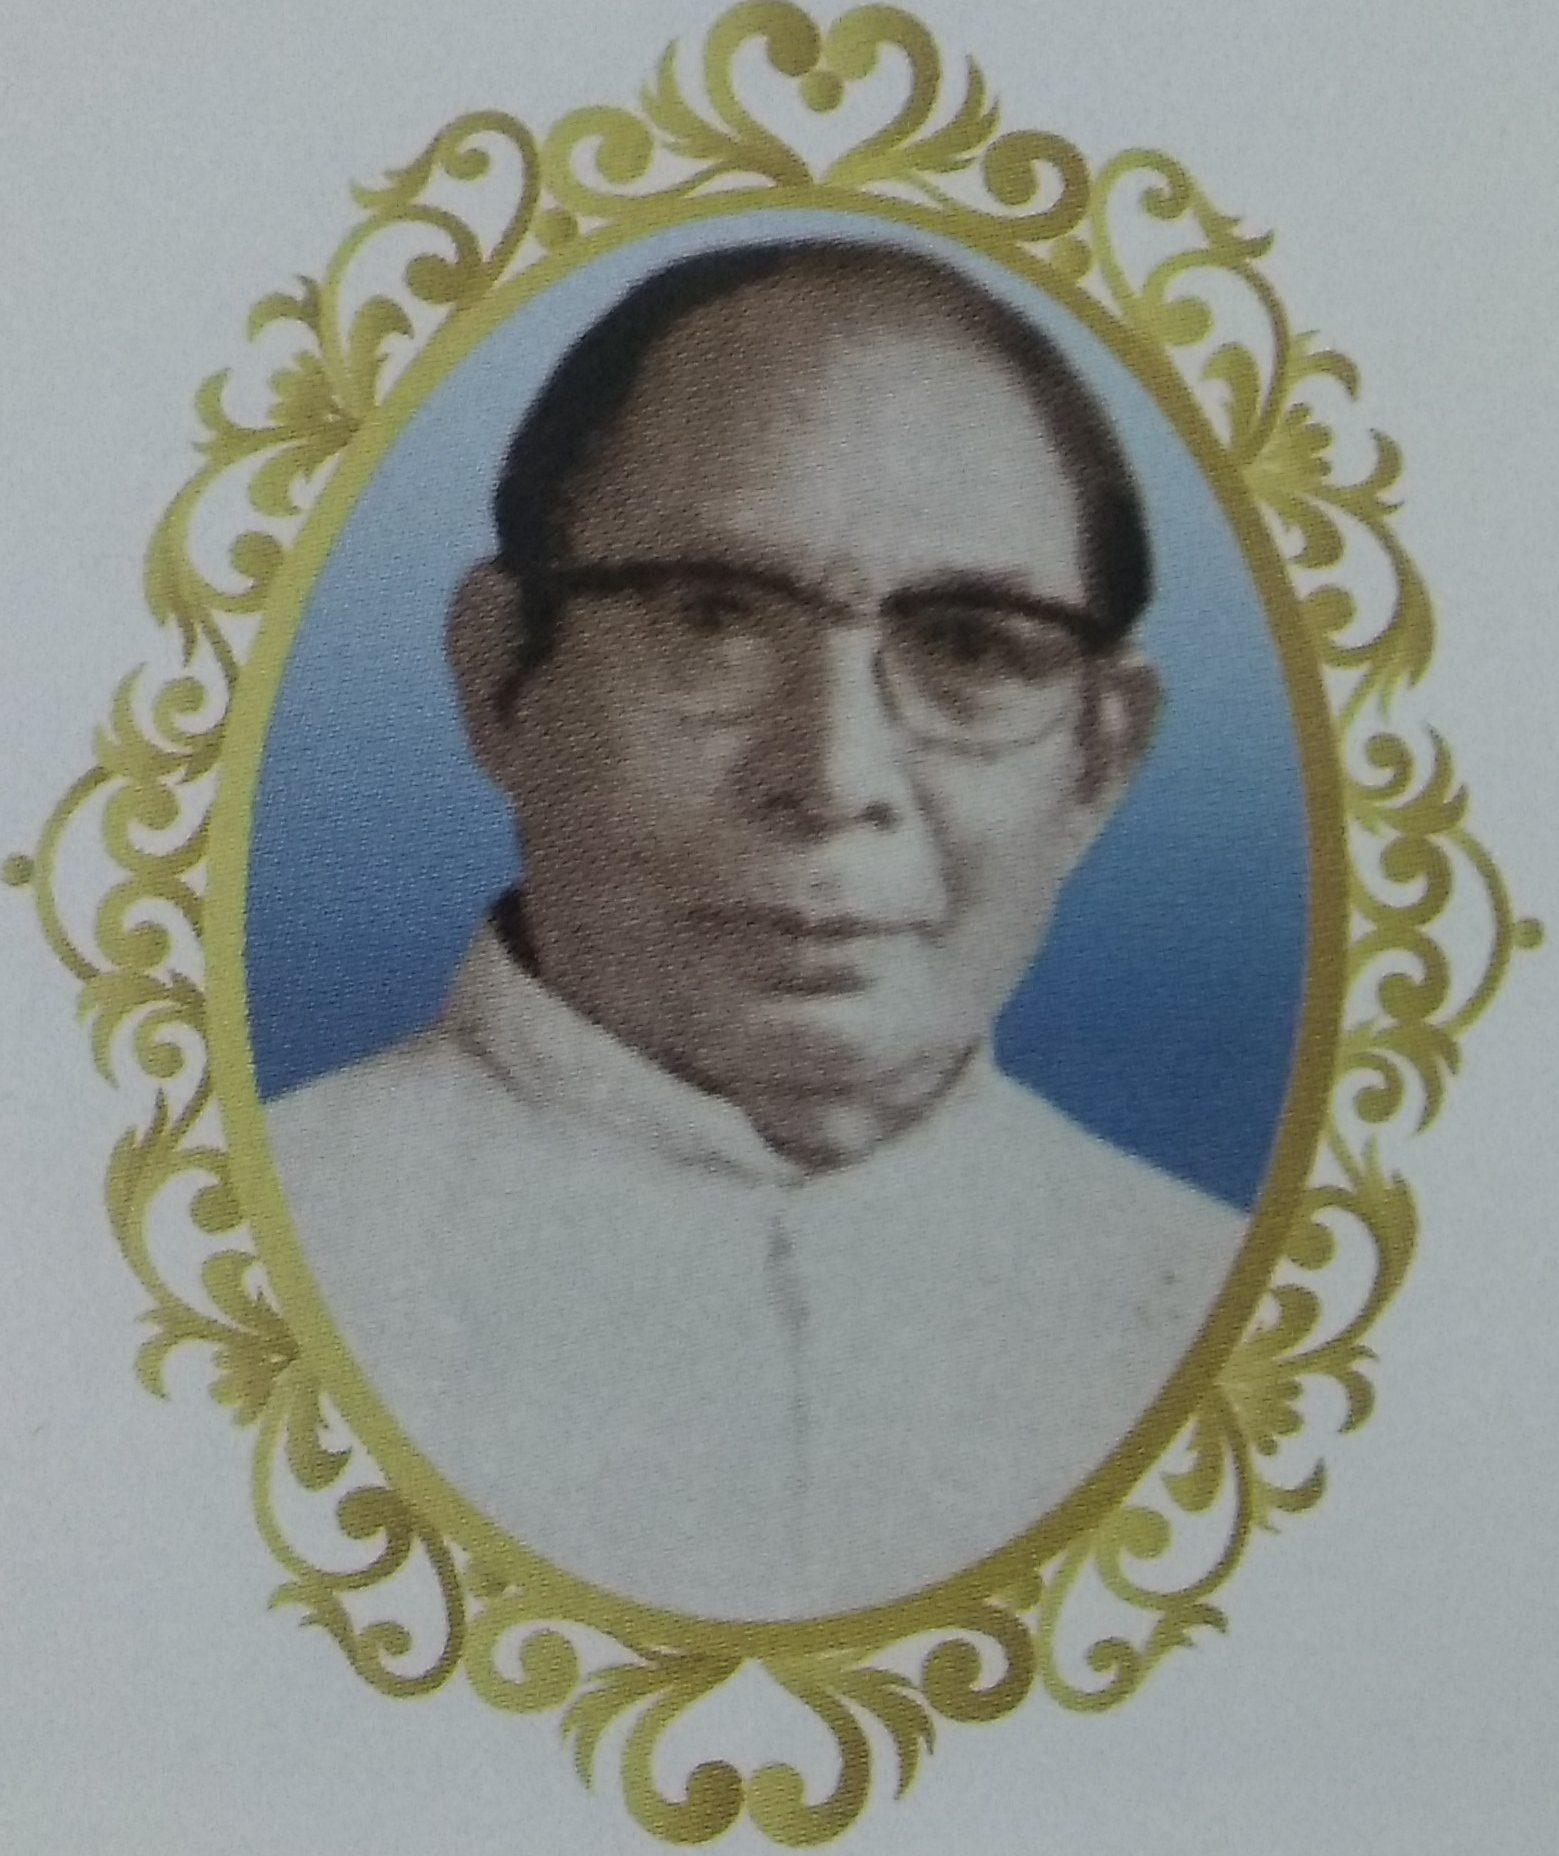 Fr. Antony Lopez